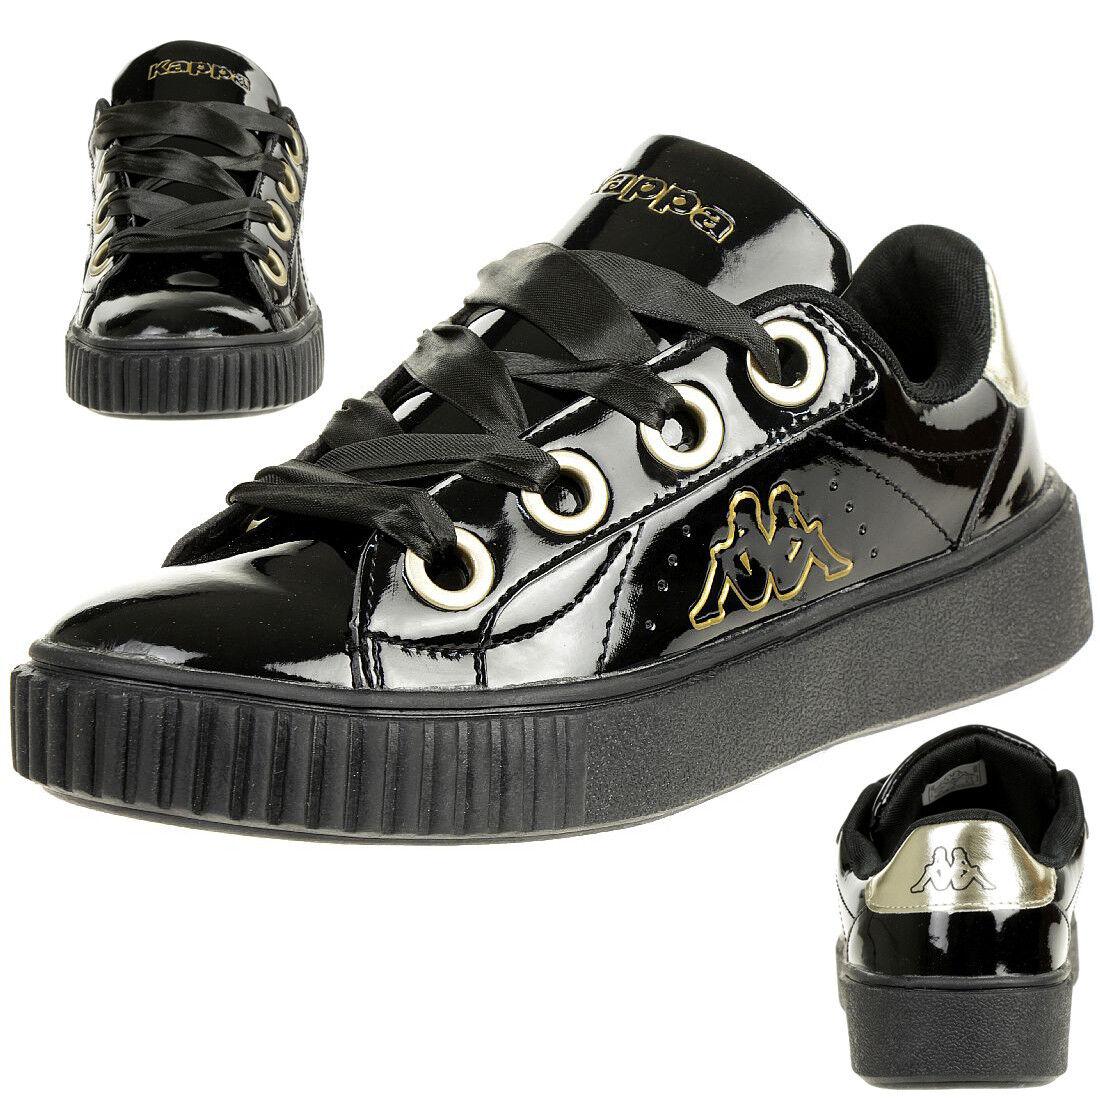 hot sale online daeb0 f3956 Kappa Schuhe Damen Sneaker Test Vergleich +++ Kappa Schuhe ...